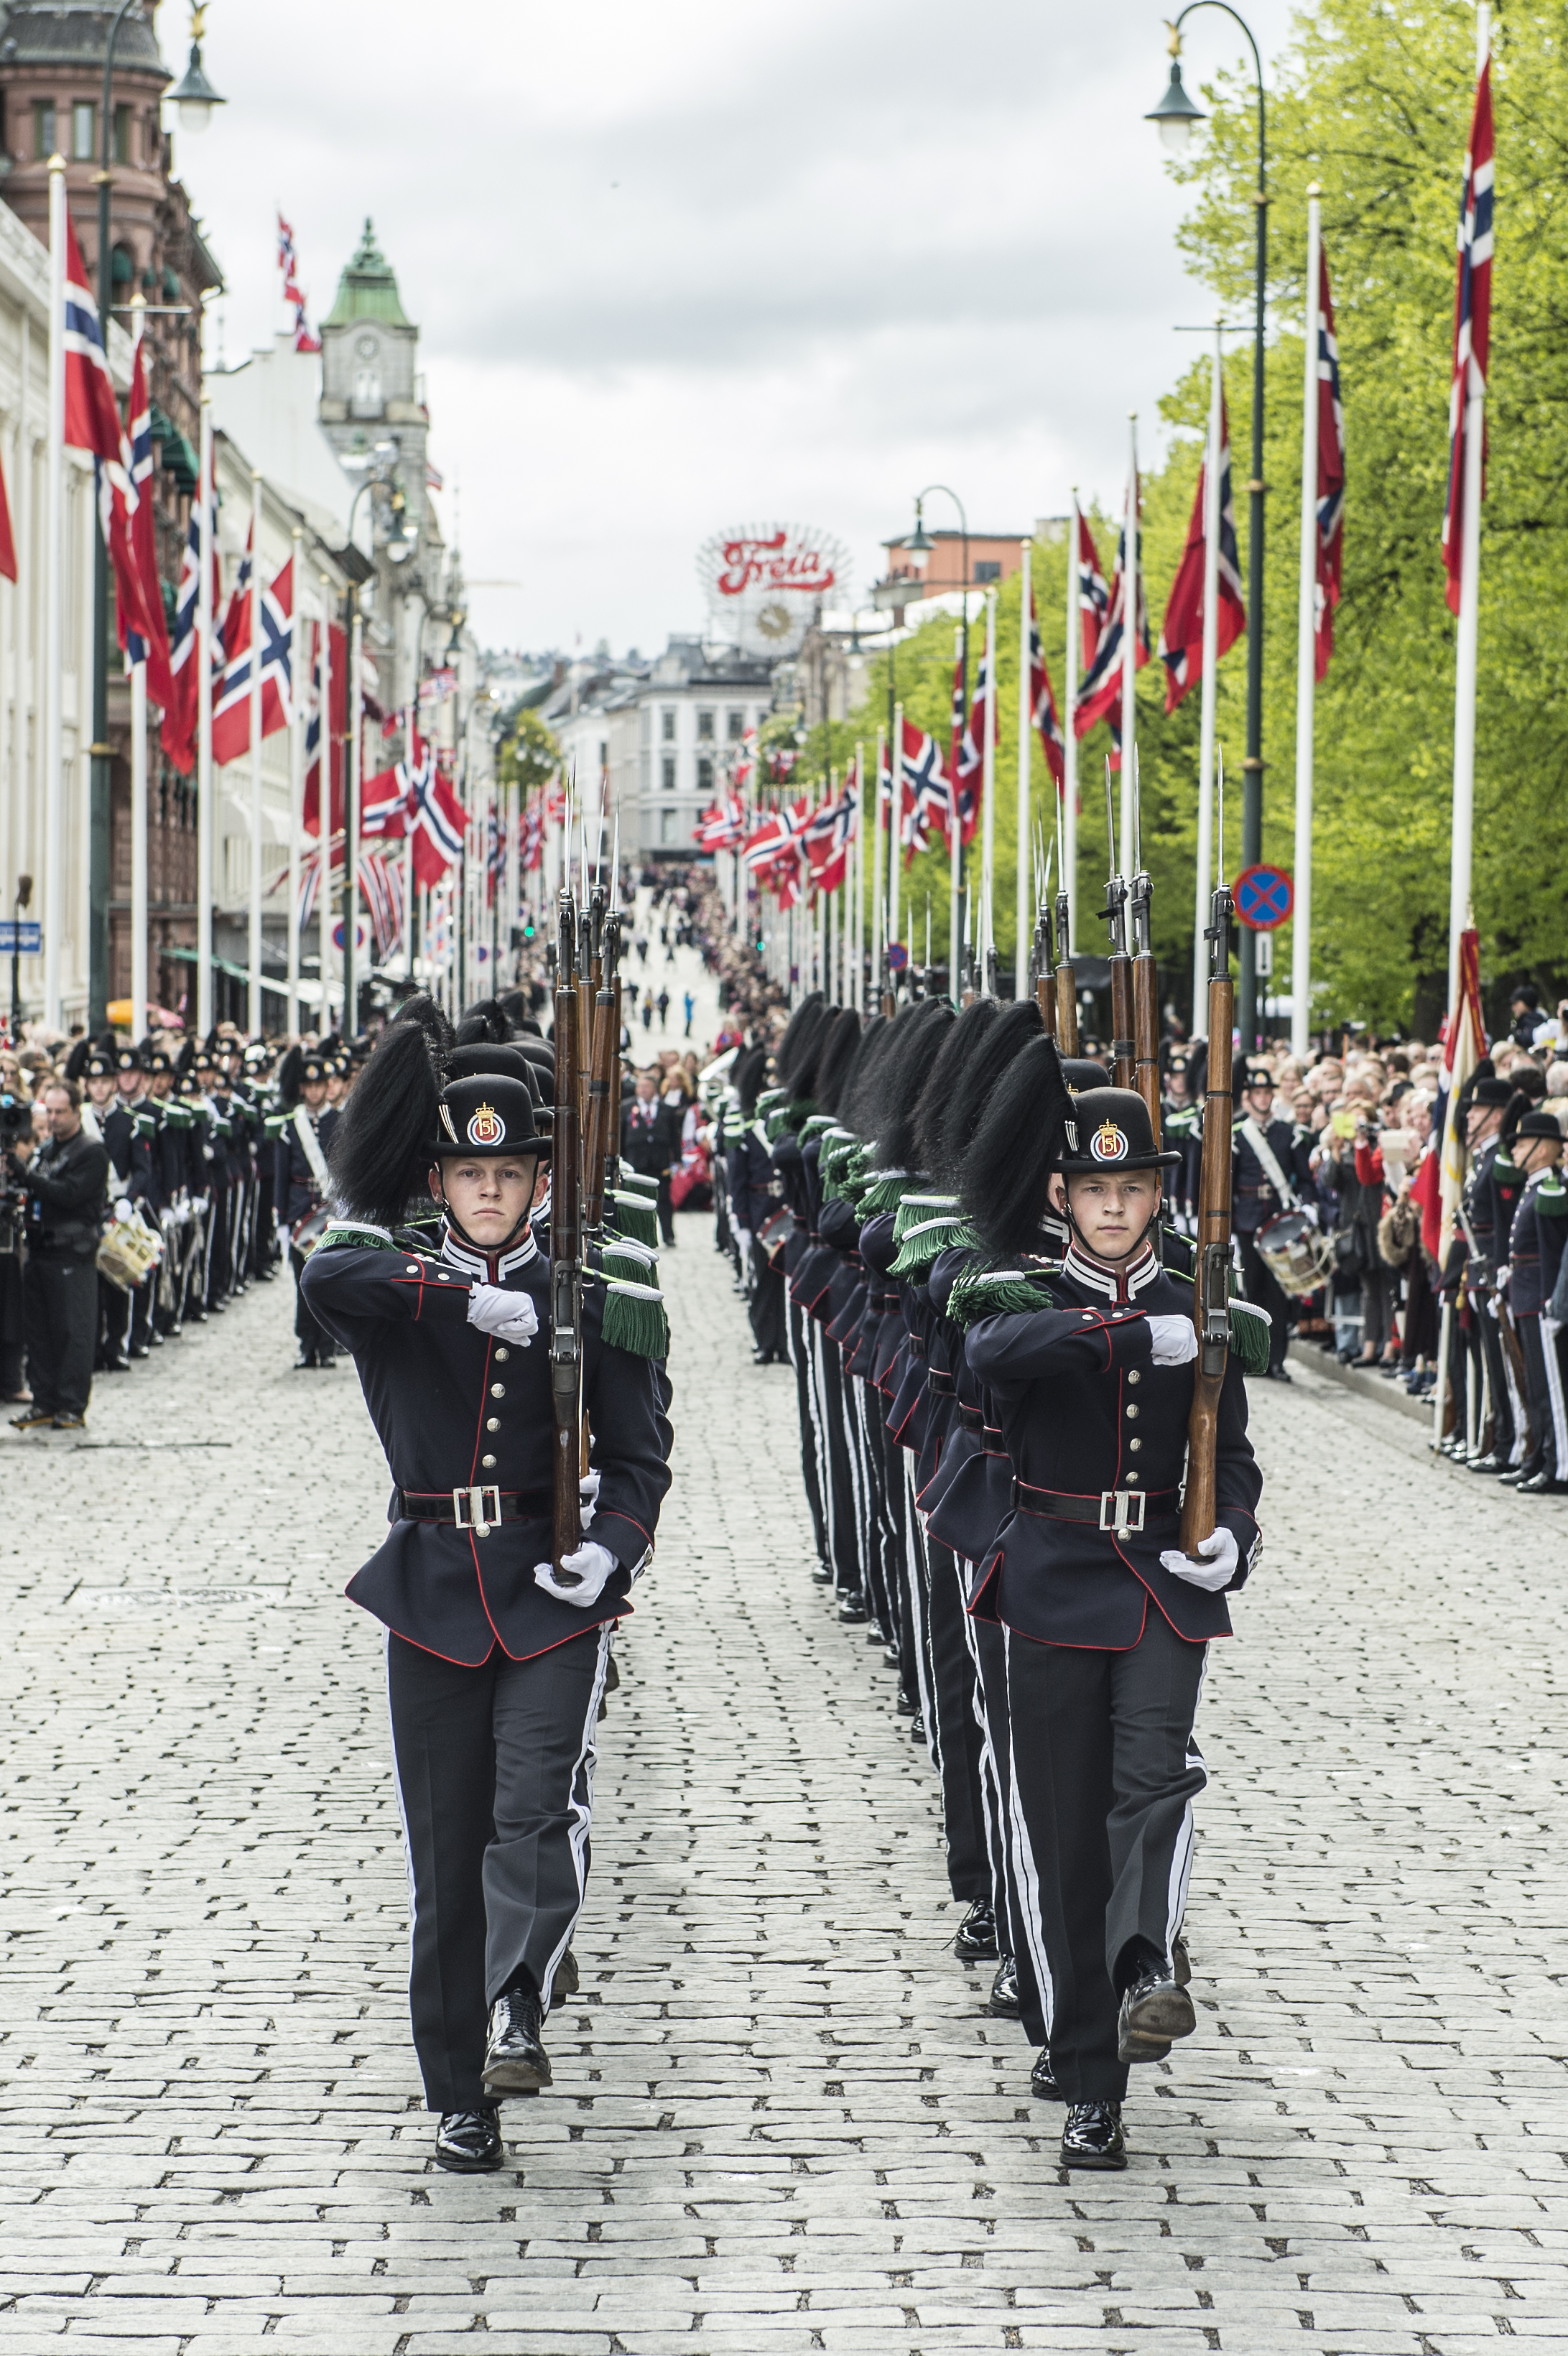 The Norwegian Army